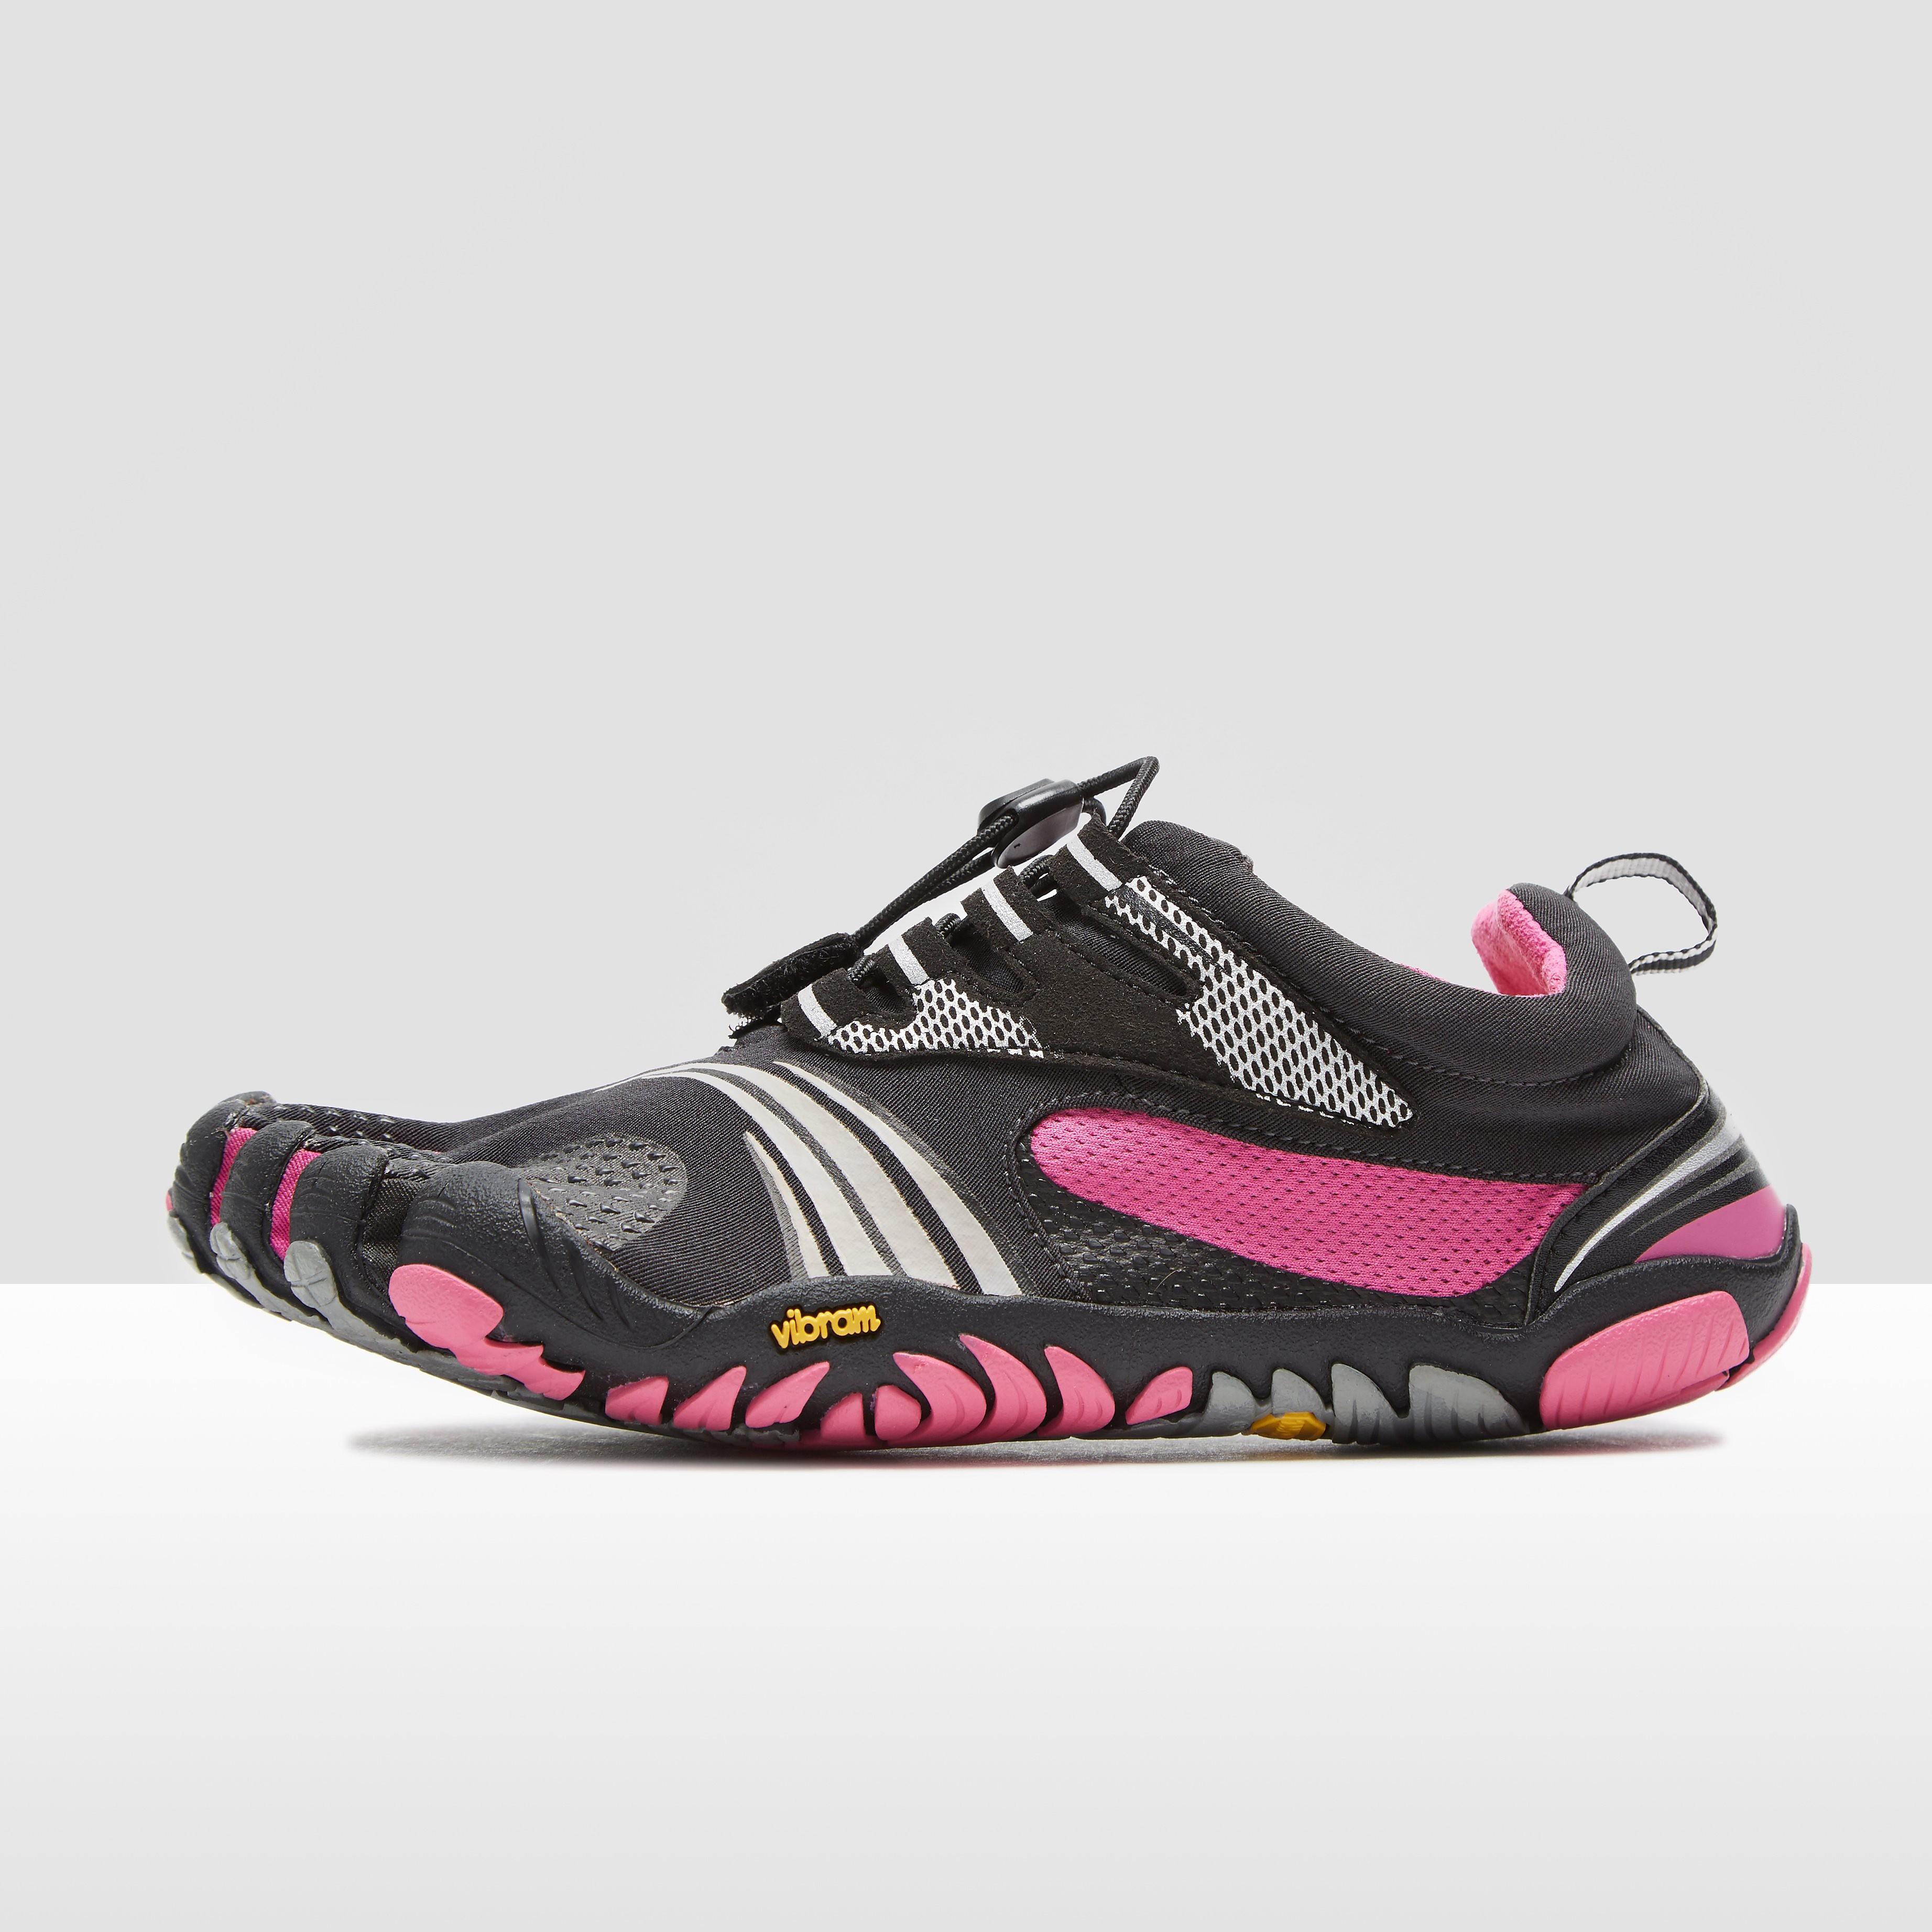 Vibram Five Fingers KMD Sport LS Women's Running Shoe